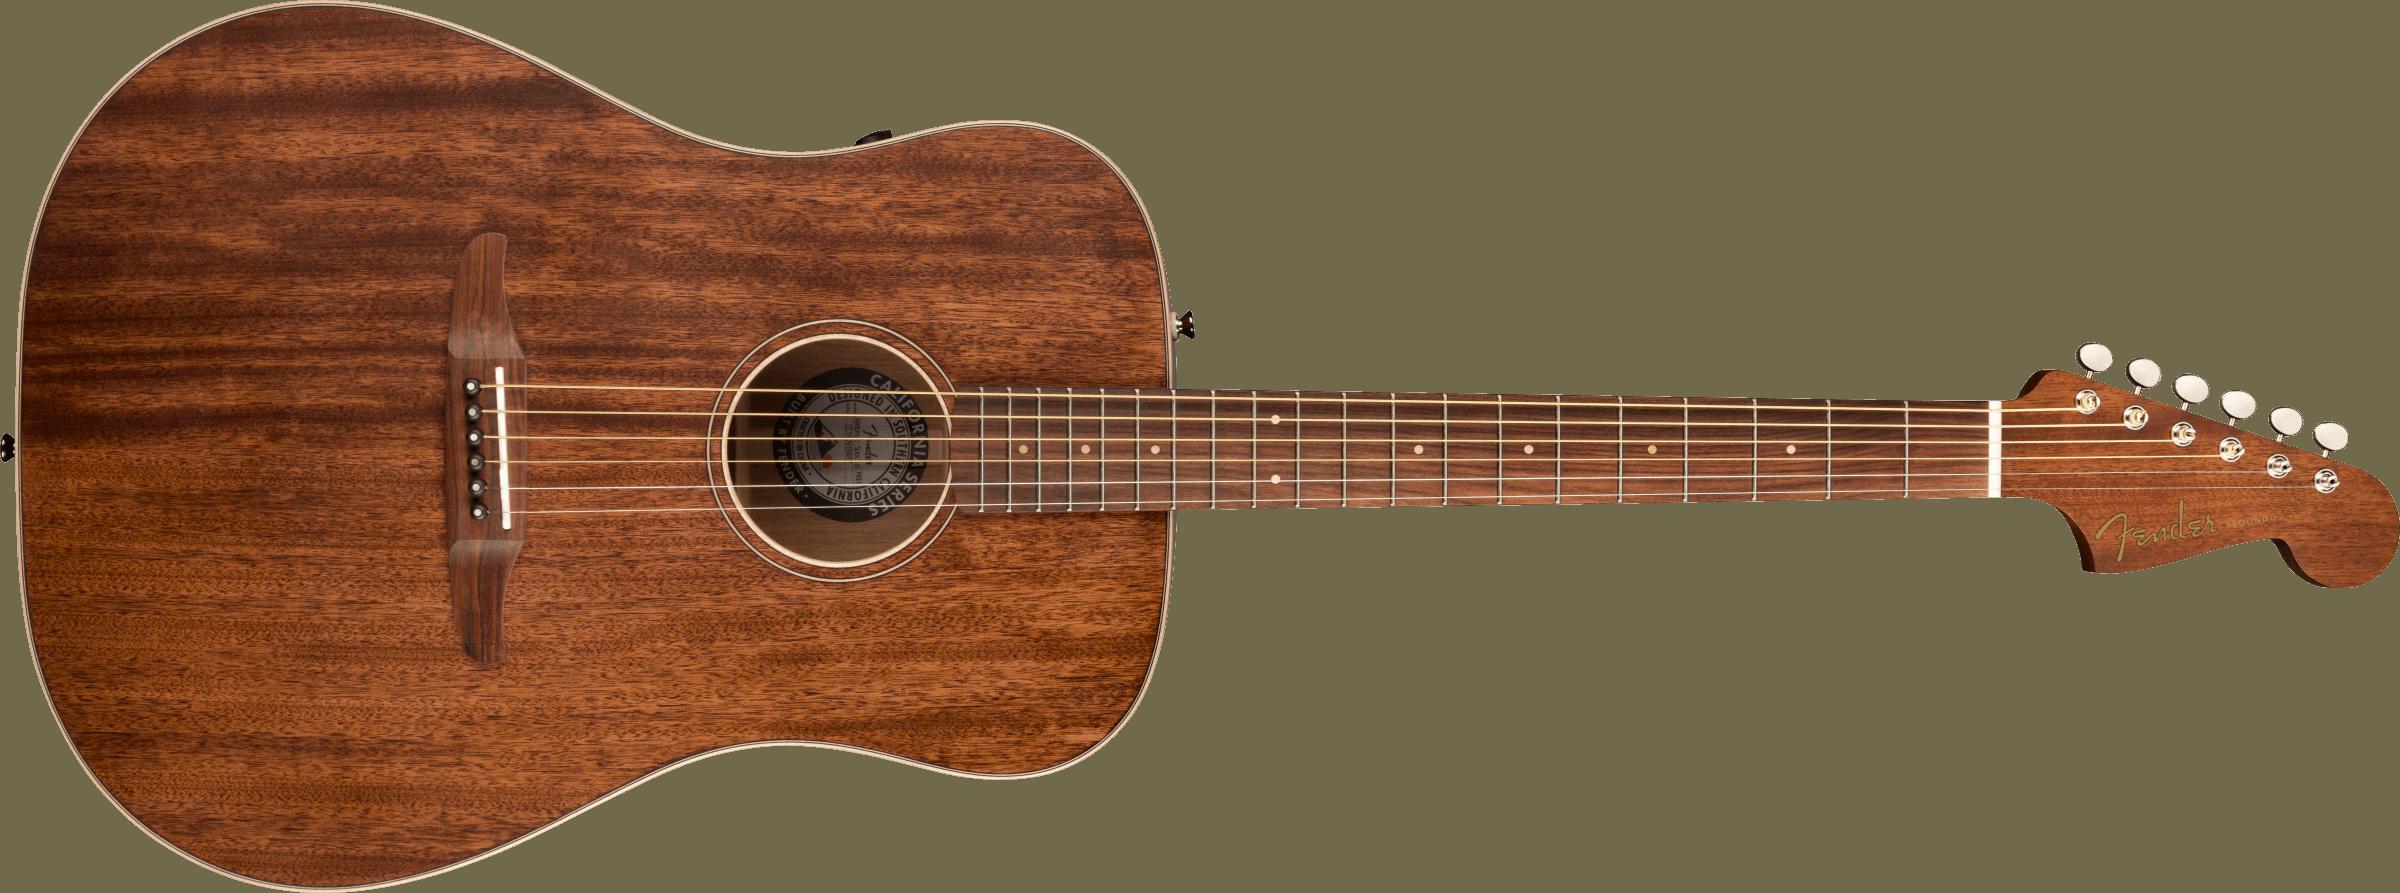 FENDER-Redondo-Special-with-Bag-All-Mahogany-Pau-Ferro-Fingerboard-Natural-sku-571004884